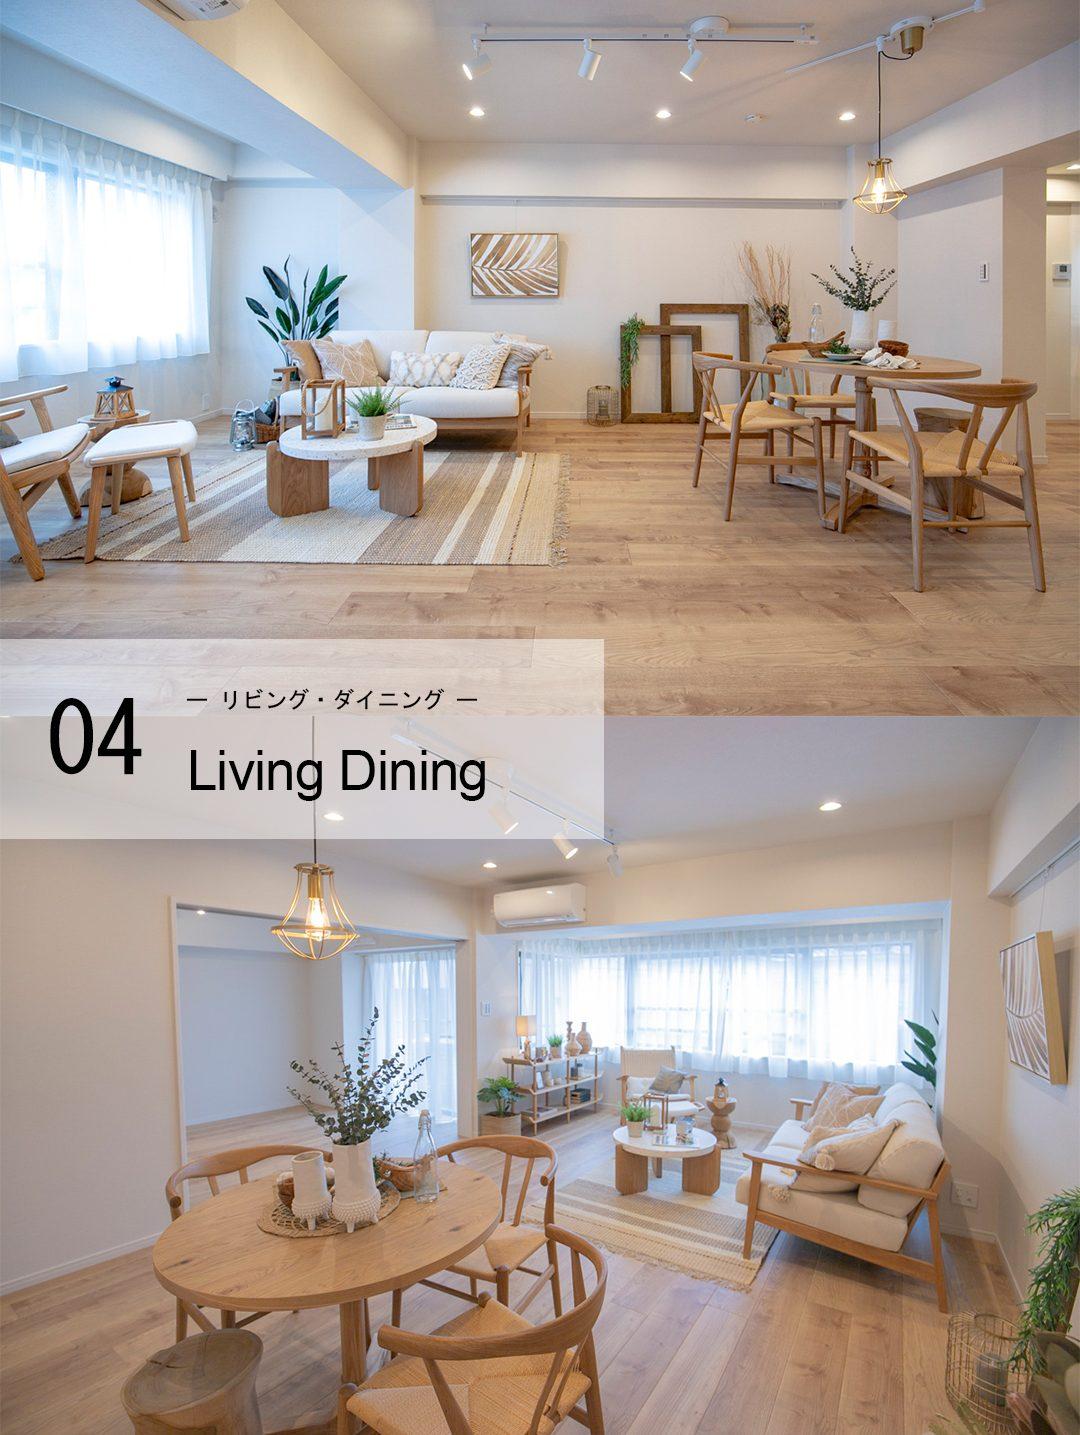 04,LivingDining,リビングダイニング